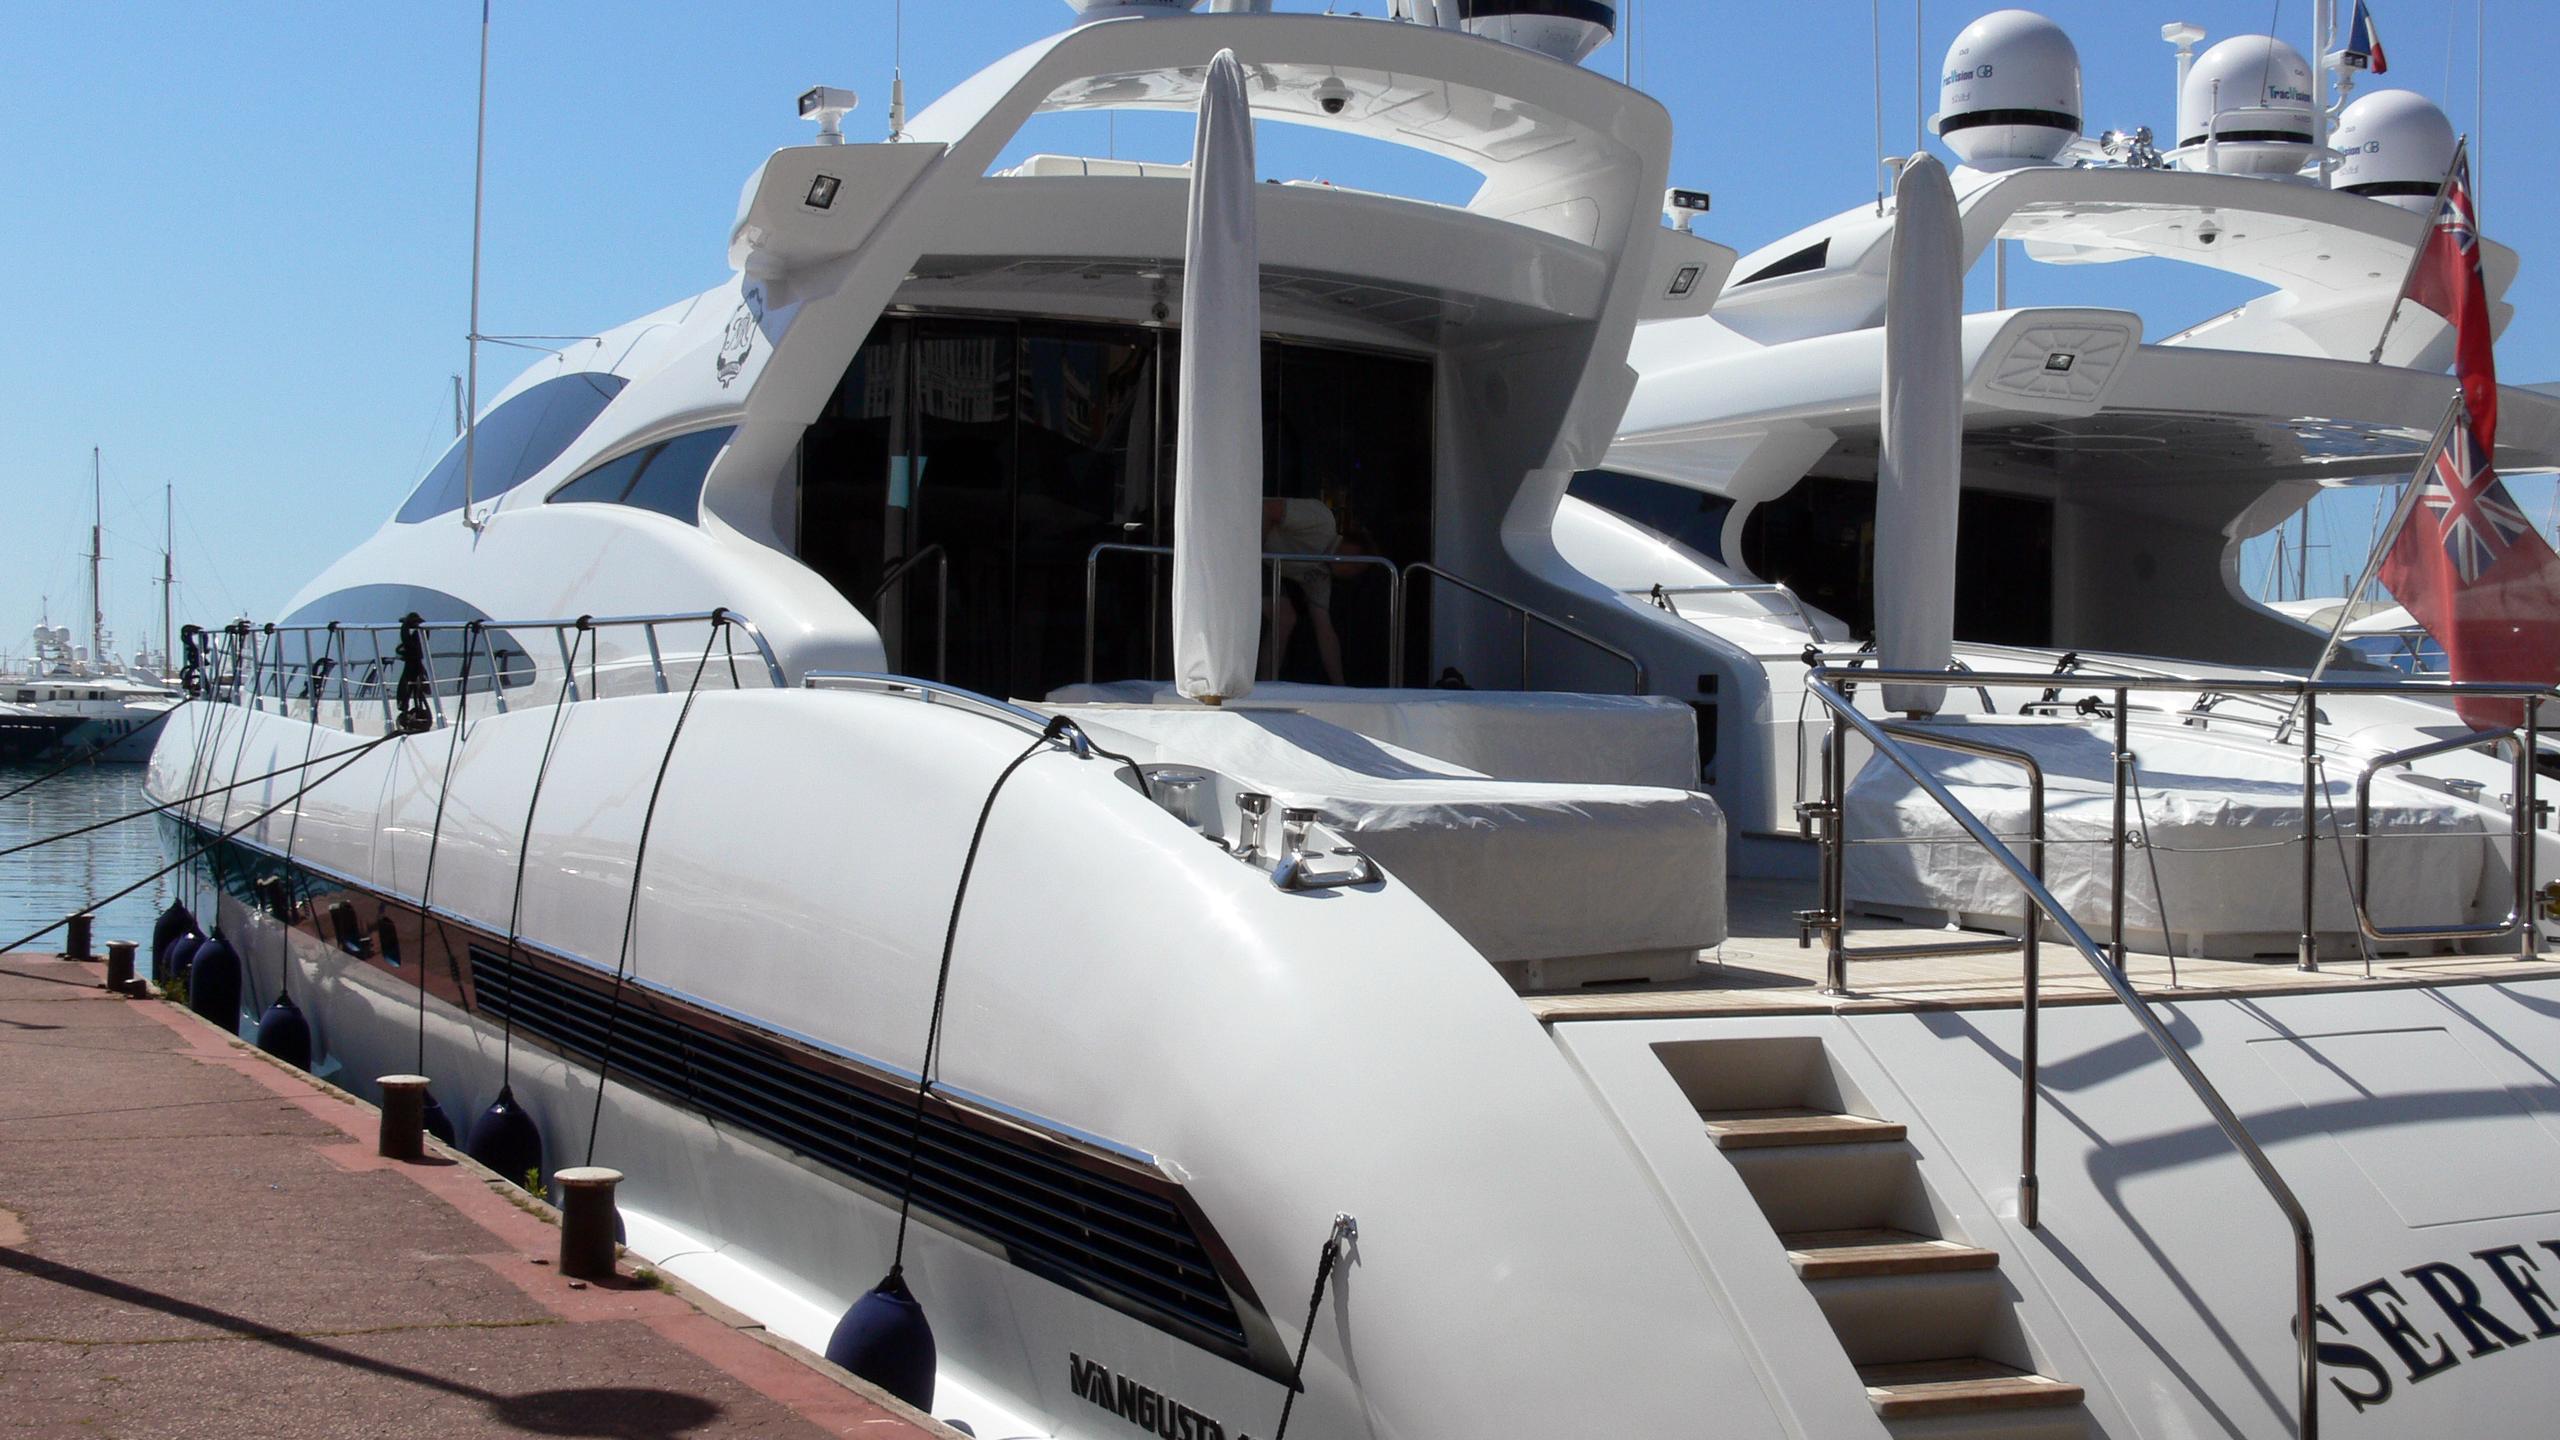 serenada-motor-yacht-overmarine-mangusta-105-2005-31m-stern